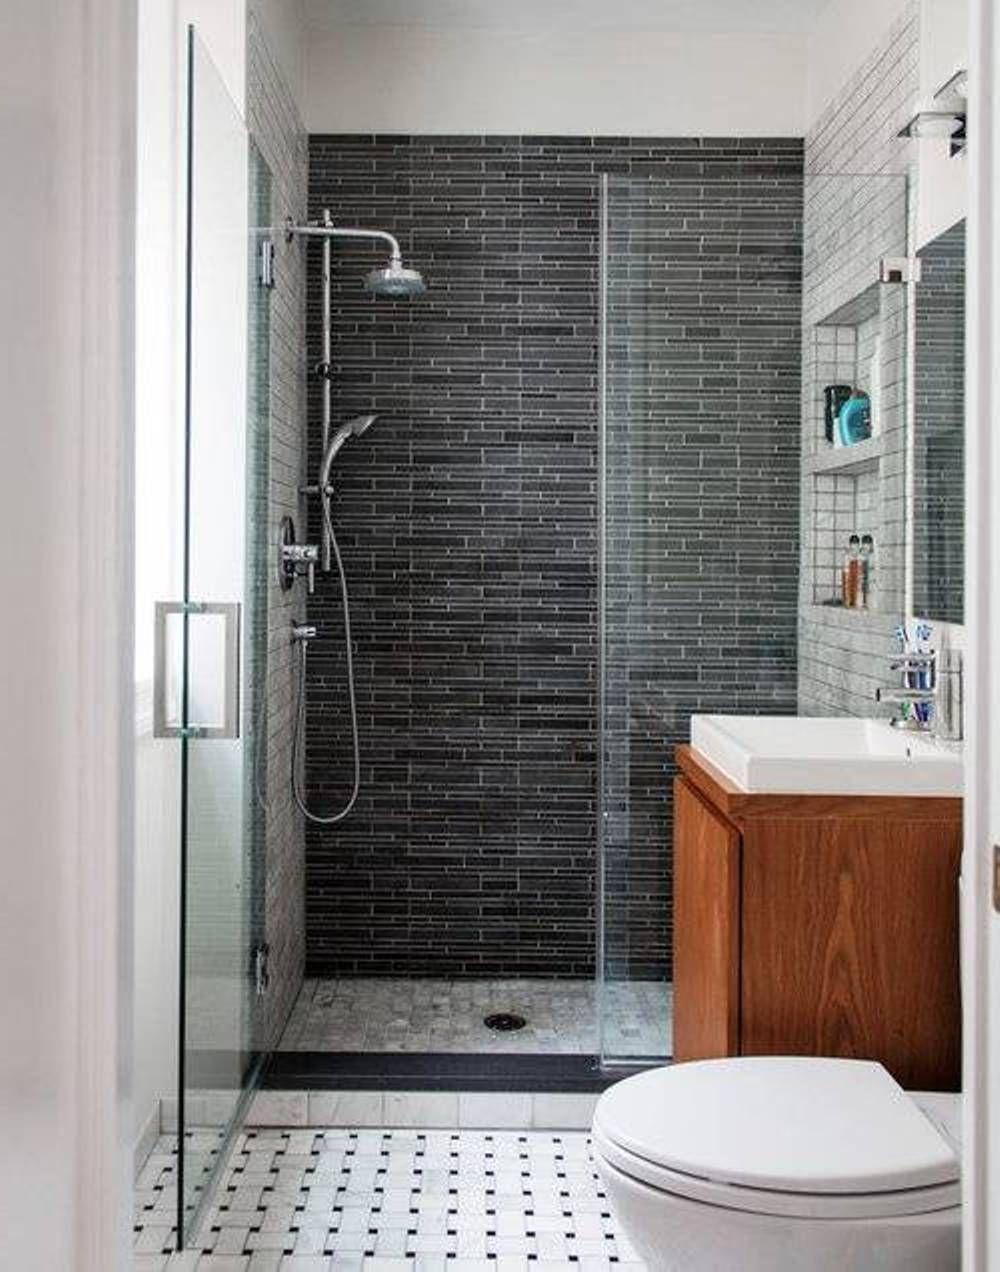 Tiny House Bathroom Bathrooms Are, Simple Bathroom Designs